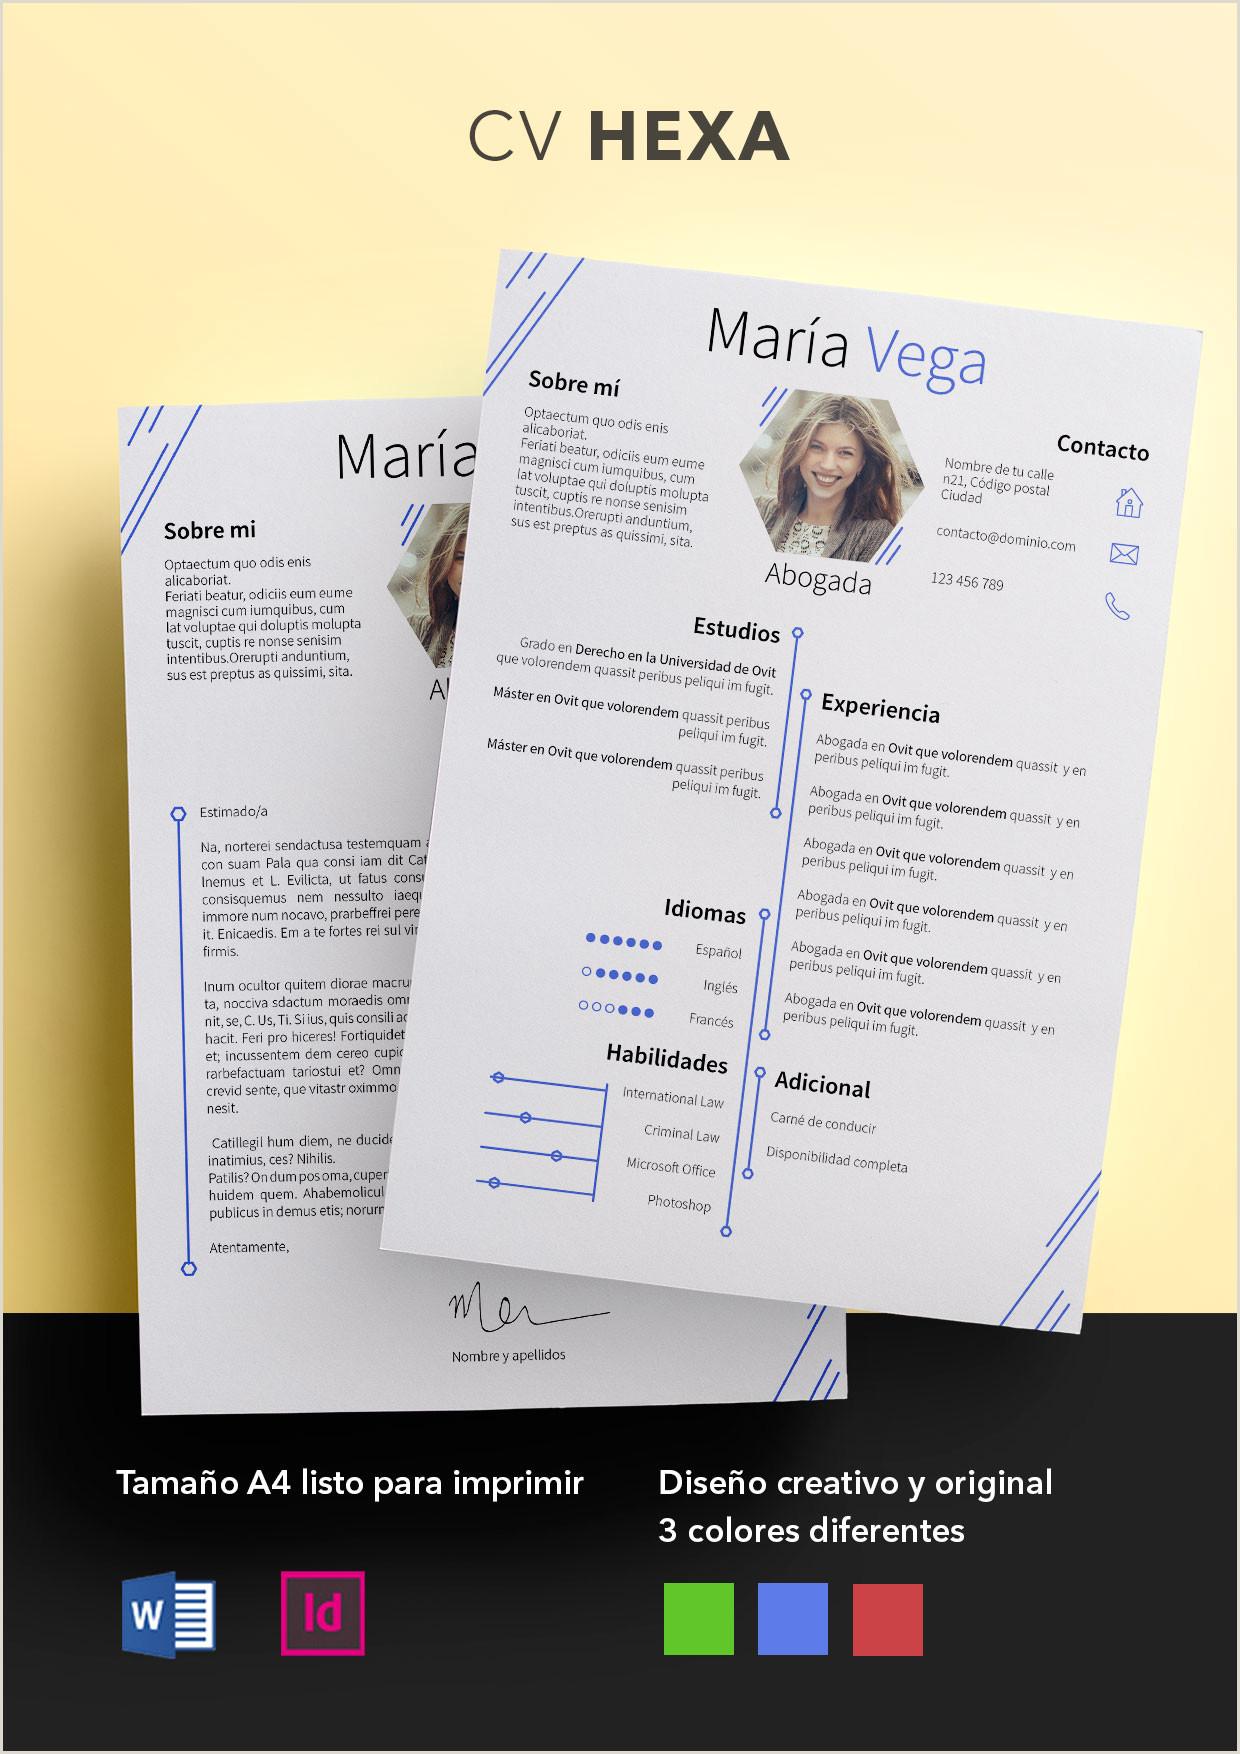 Modelo De Curriculum Vitae Para Rellenar E Imprimir Currculum Vitae Modelo Hexa